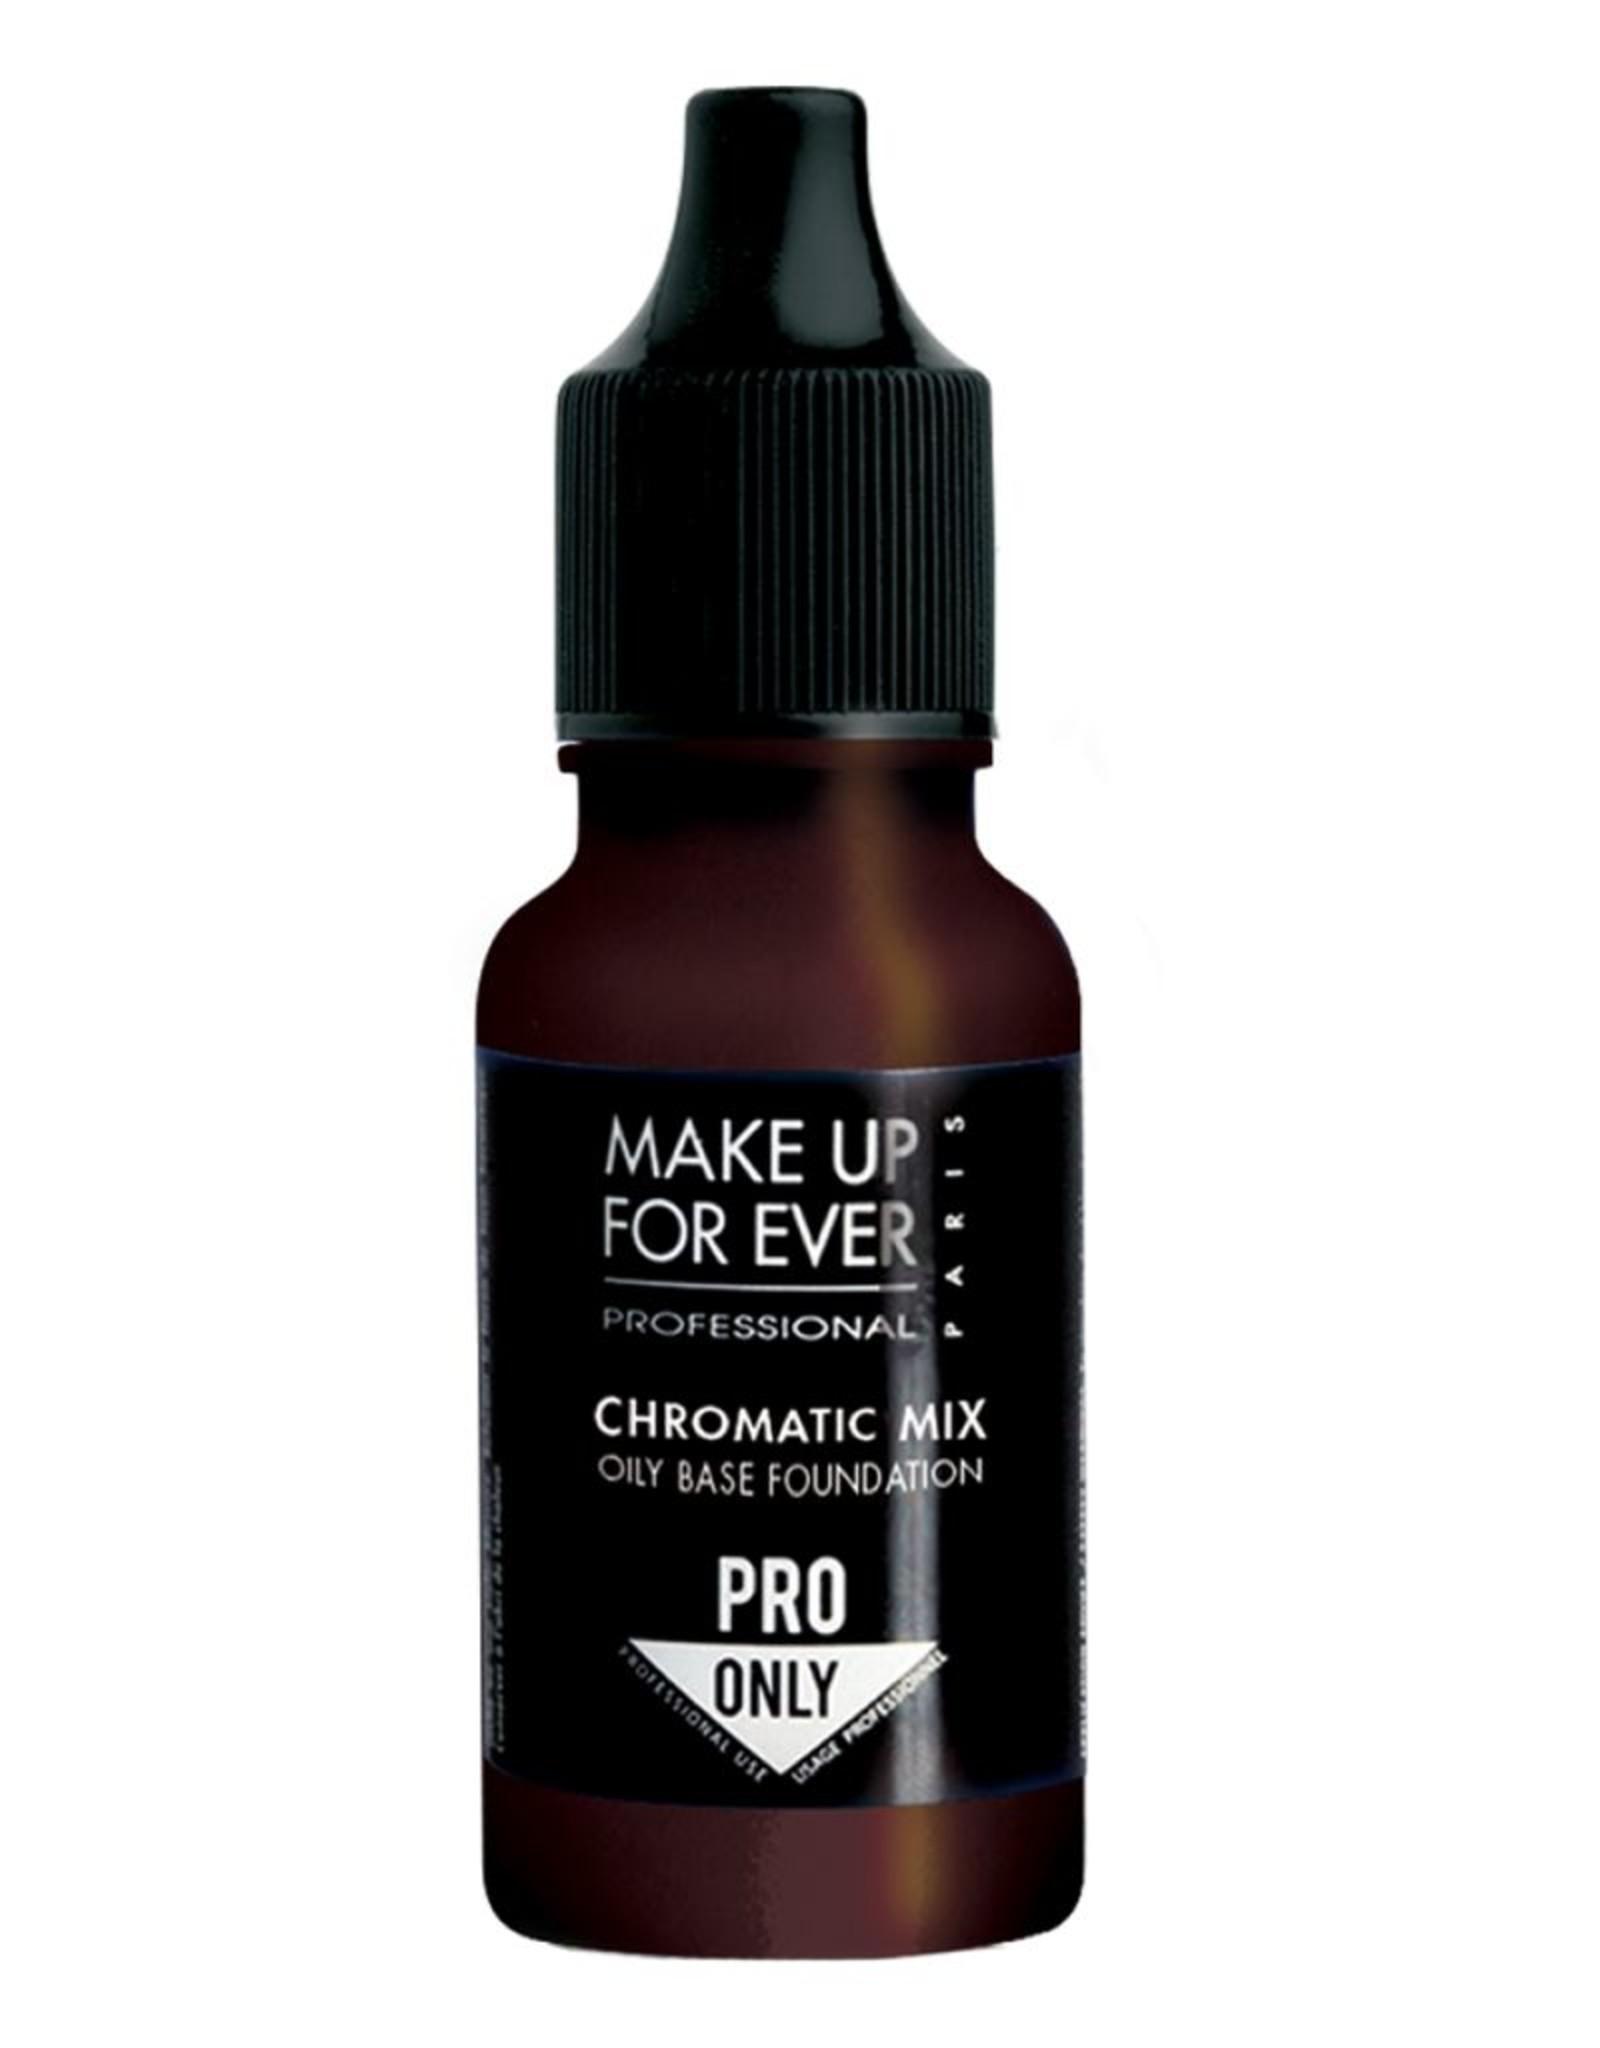 MUFE CHROMATIC MIX 13ML (Base Oil) #15 Brun / Brown